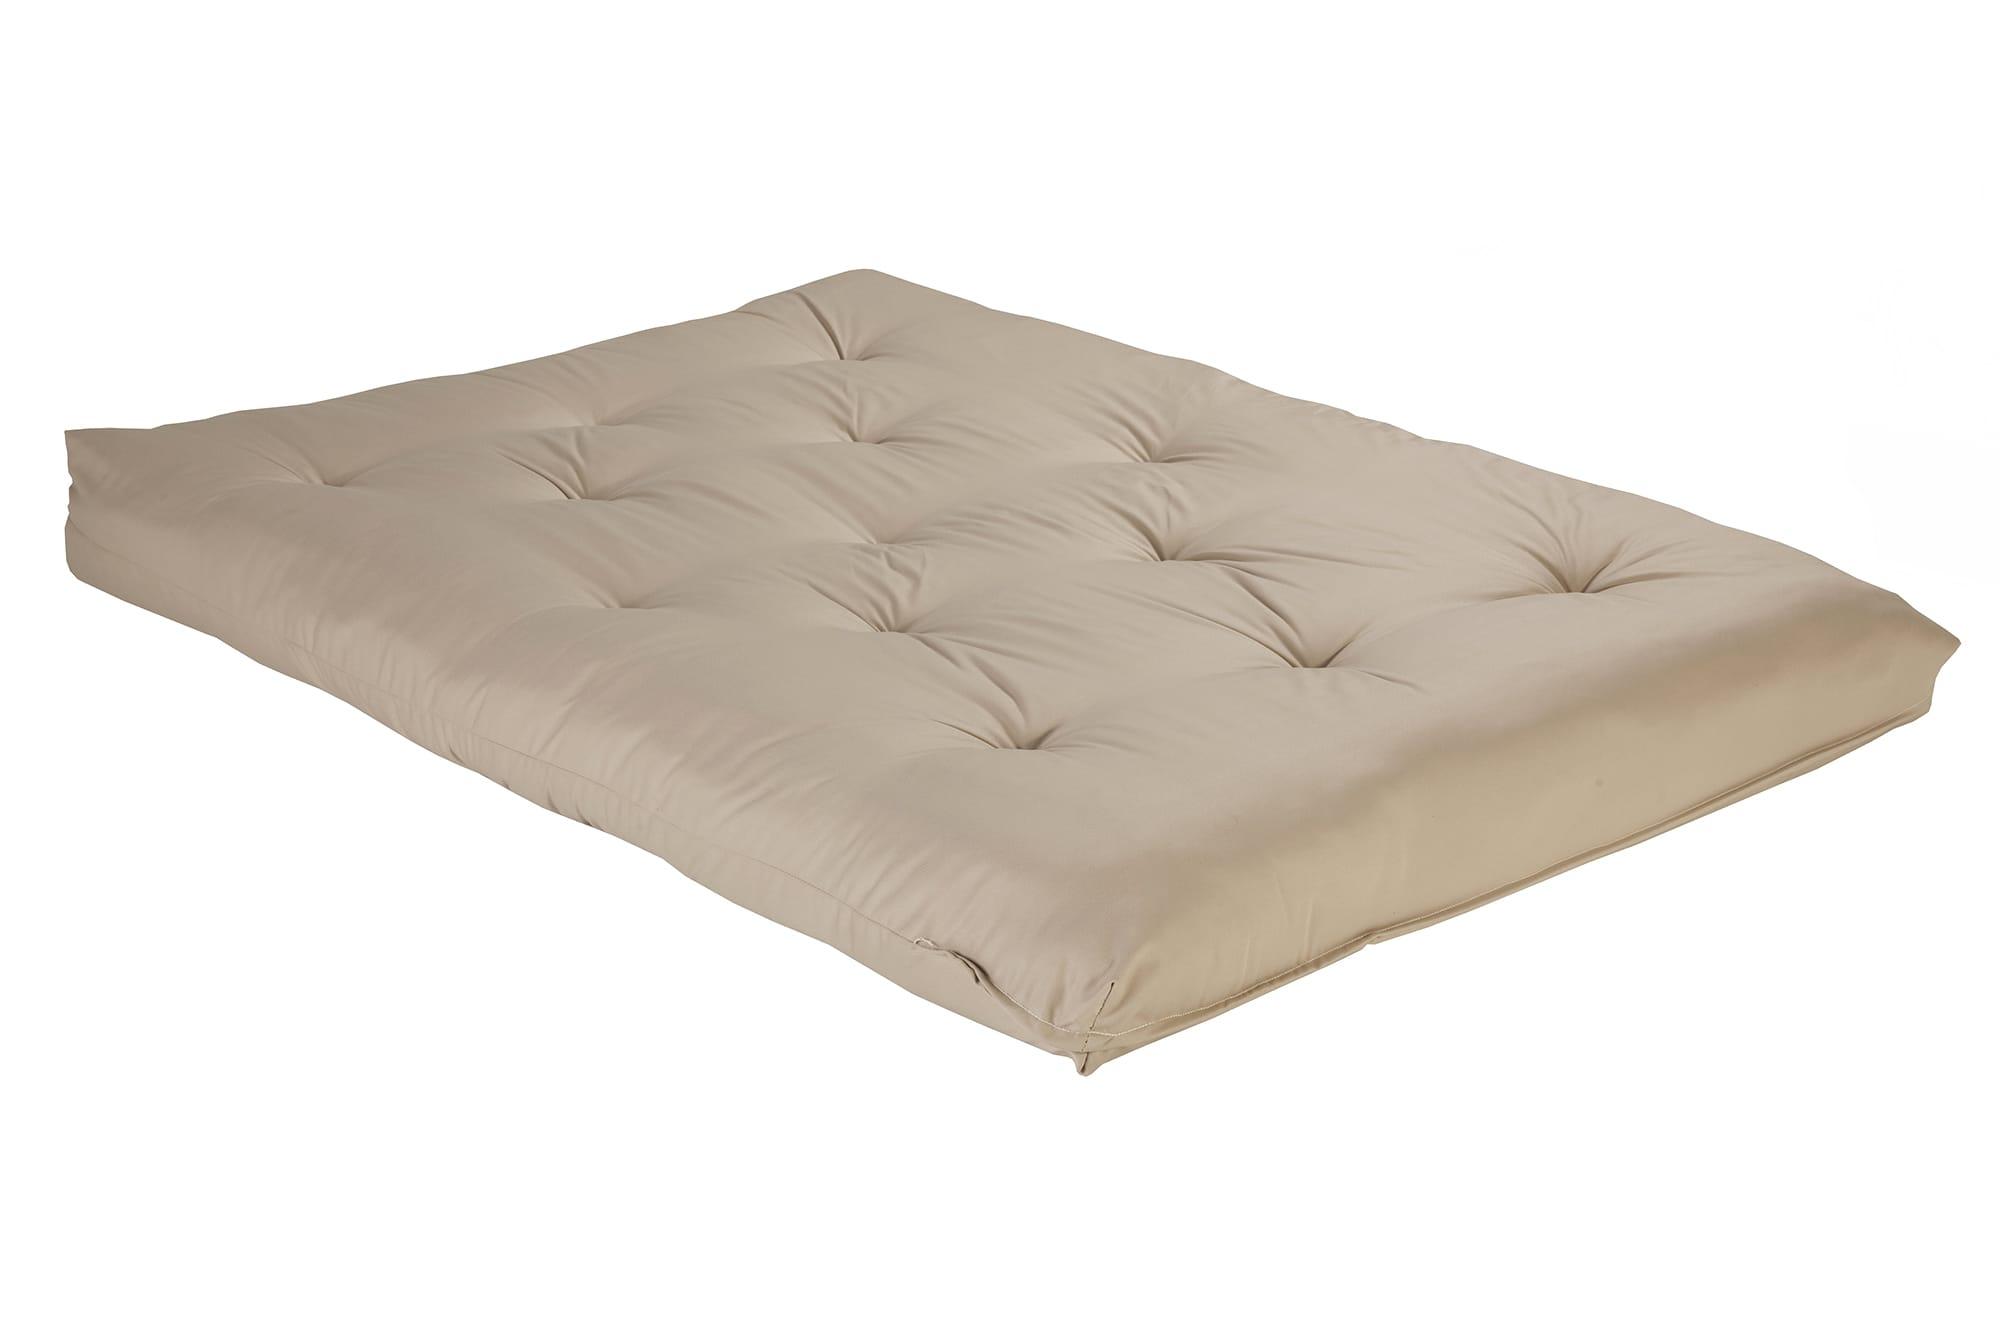 Fashion Bed Futon Mattress